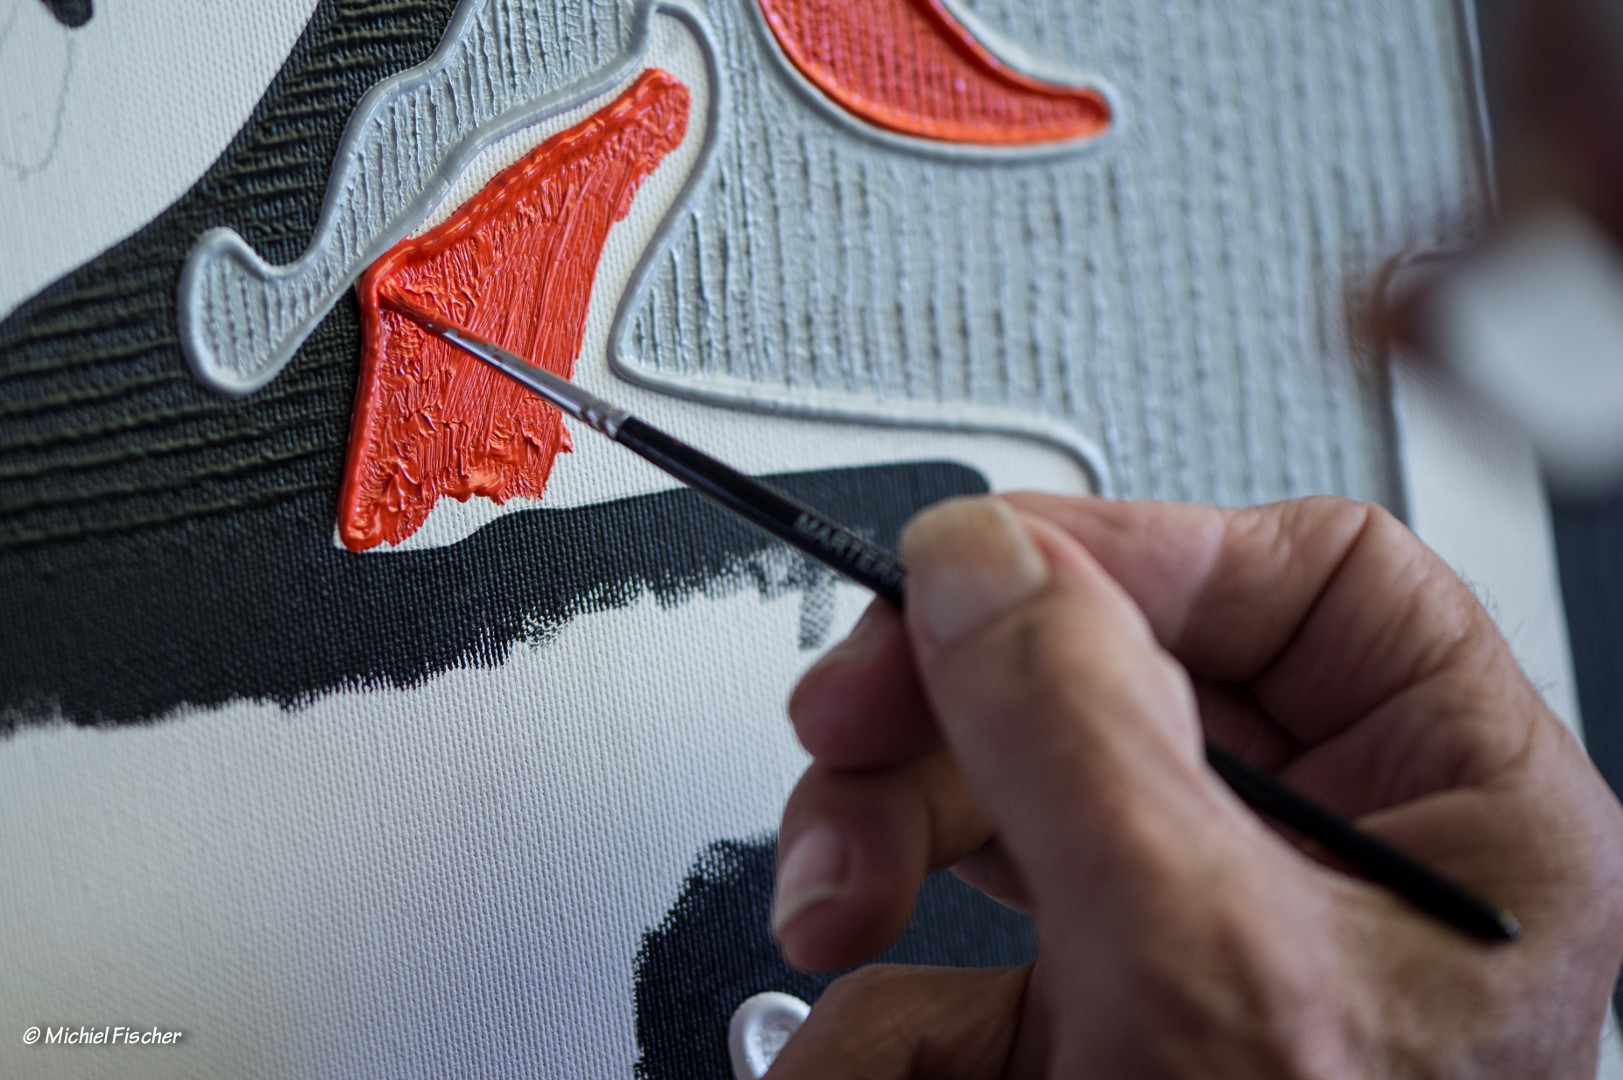 Close up detail of Vita painting